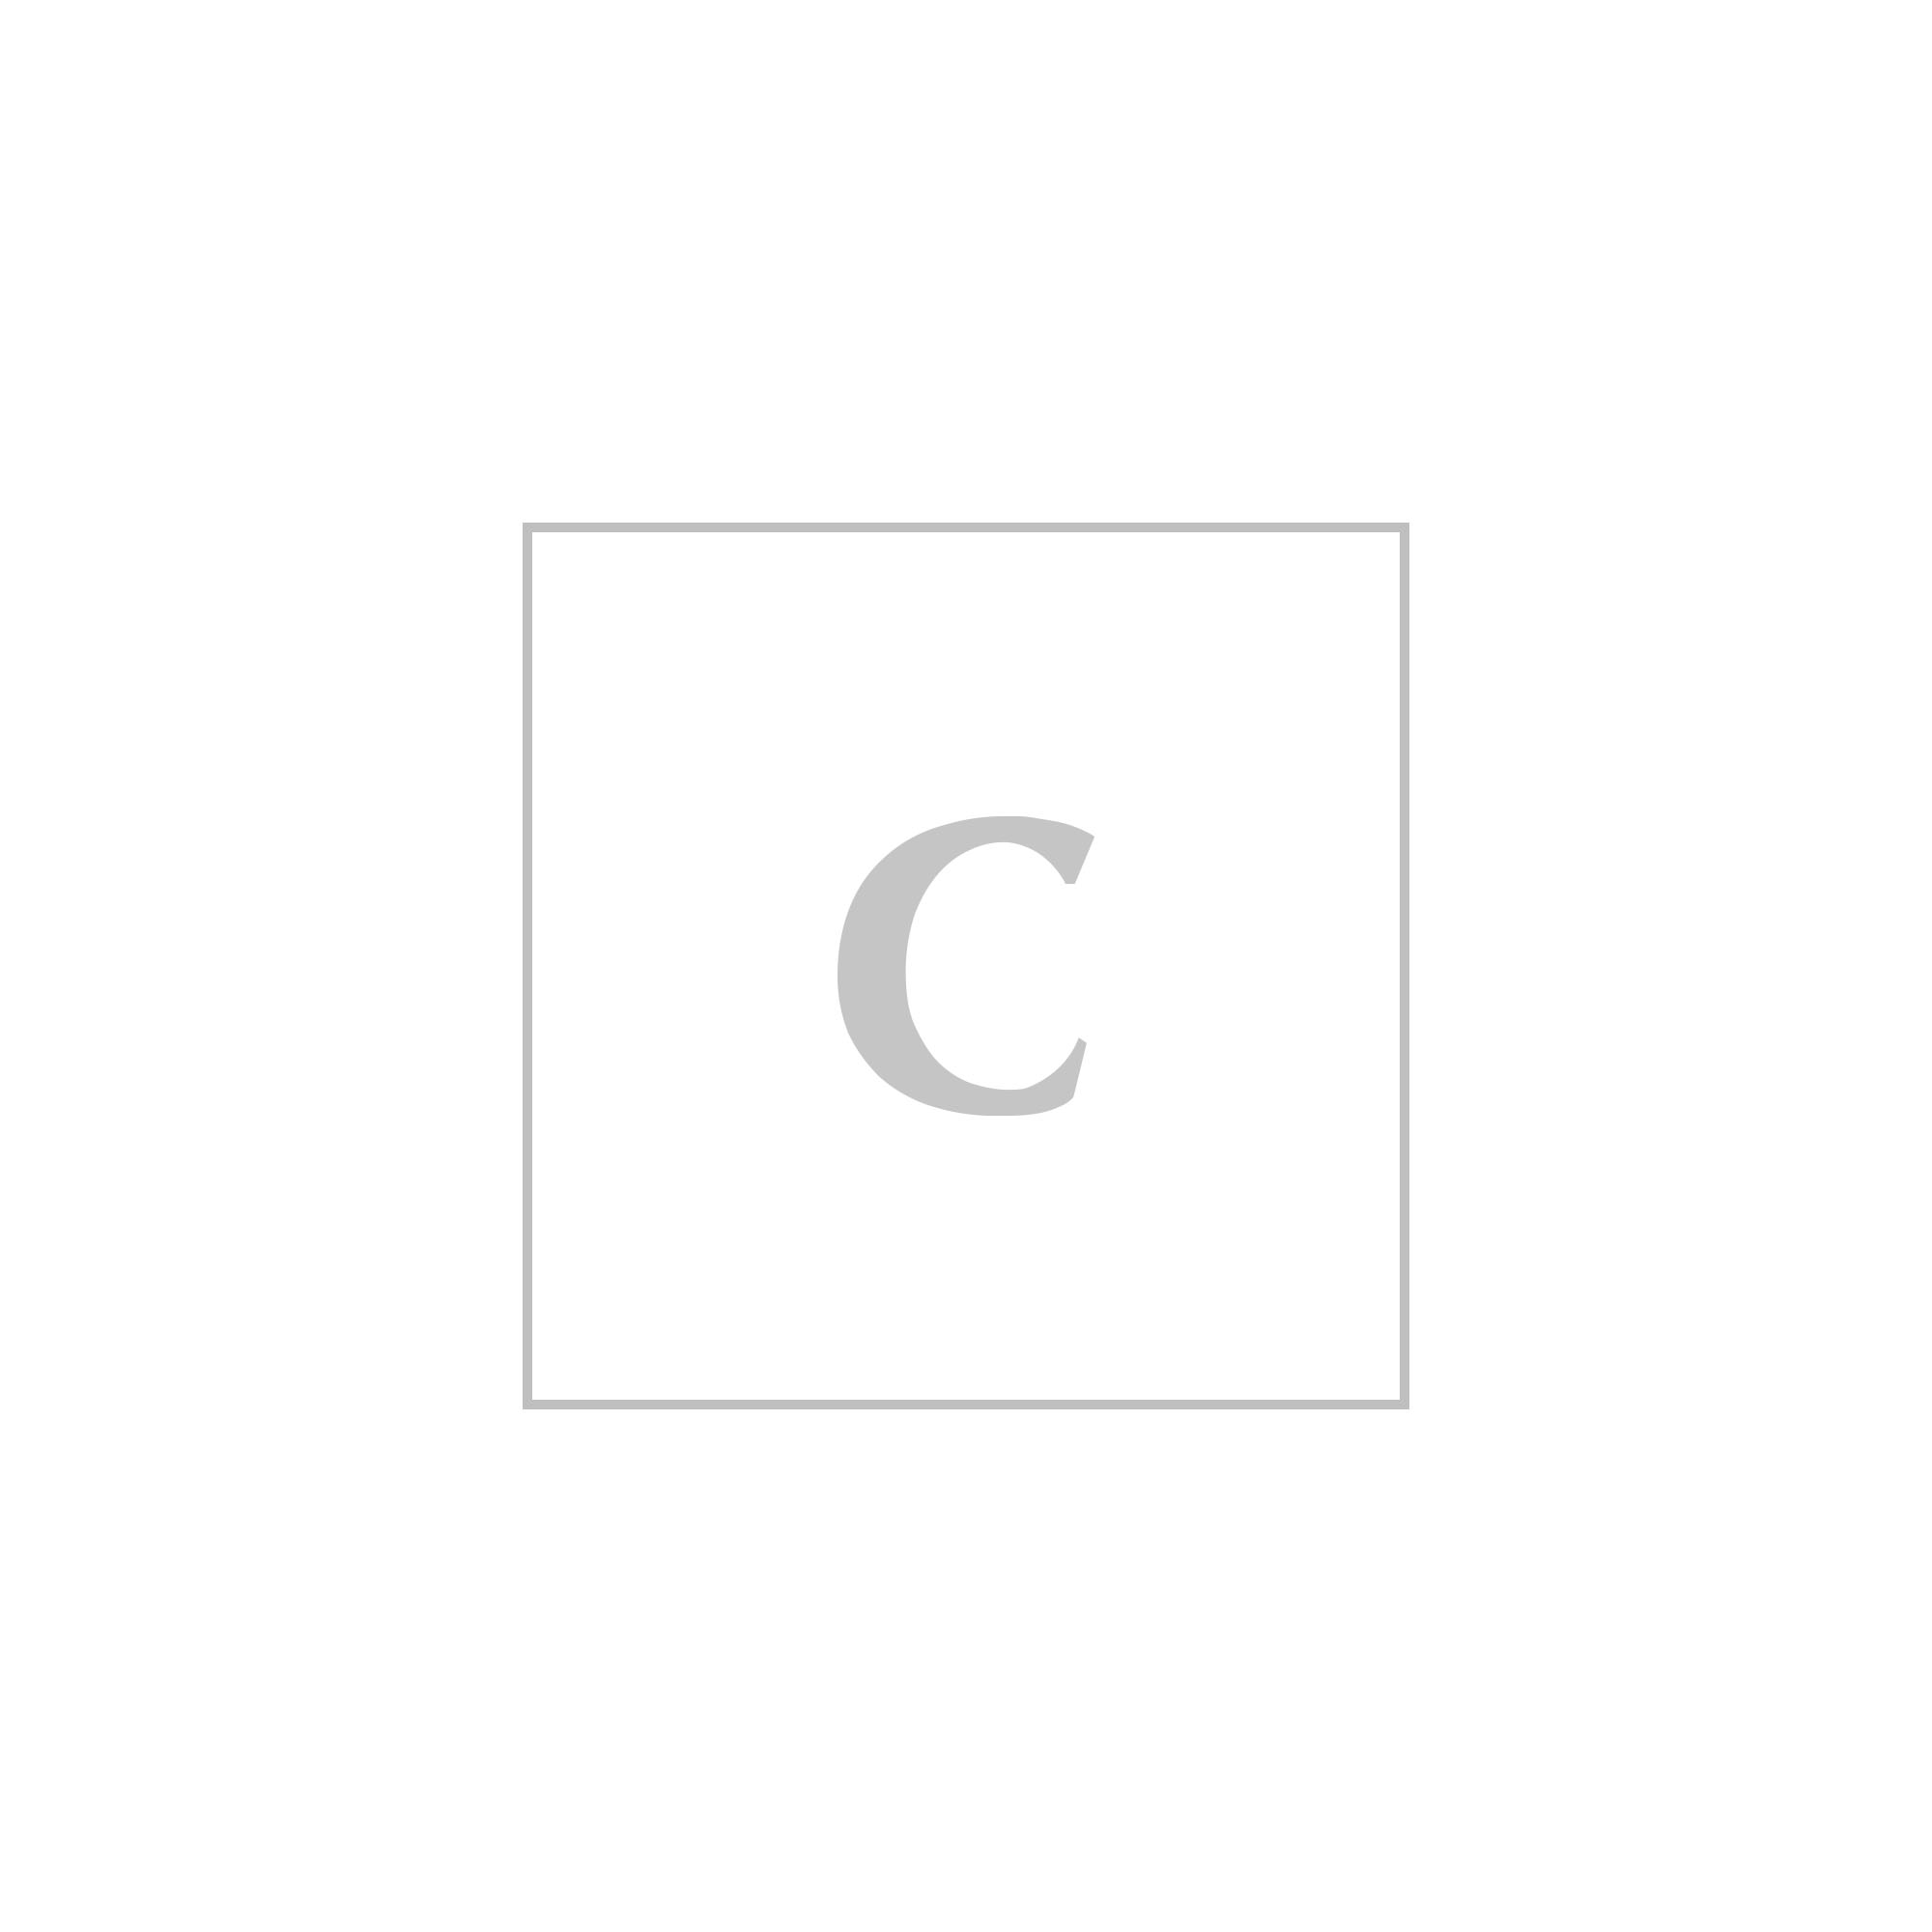 Stella mccartney felpa girocollo light bricolage